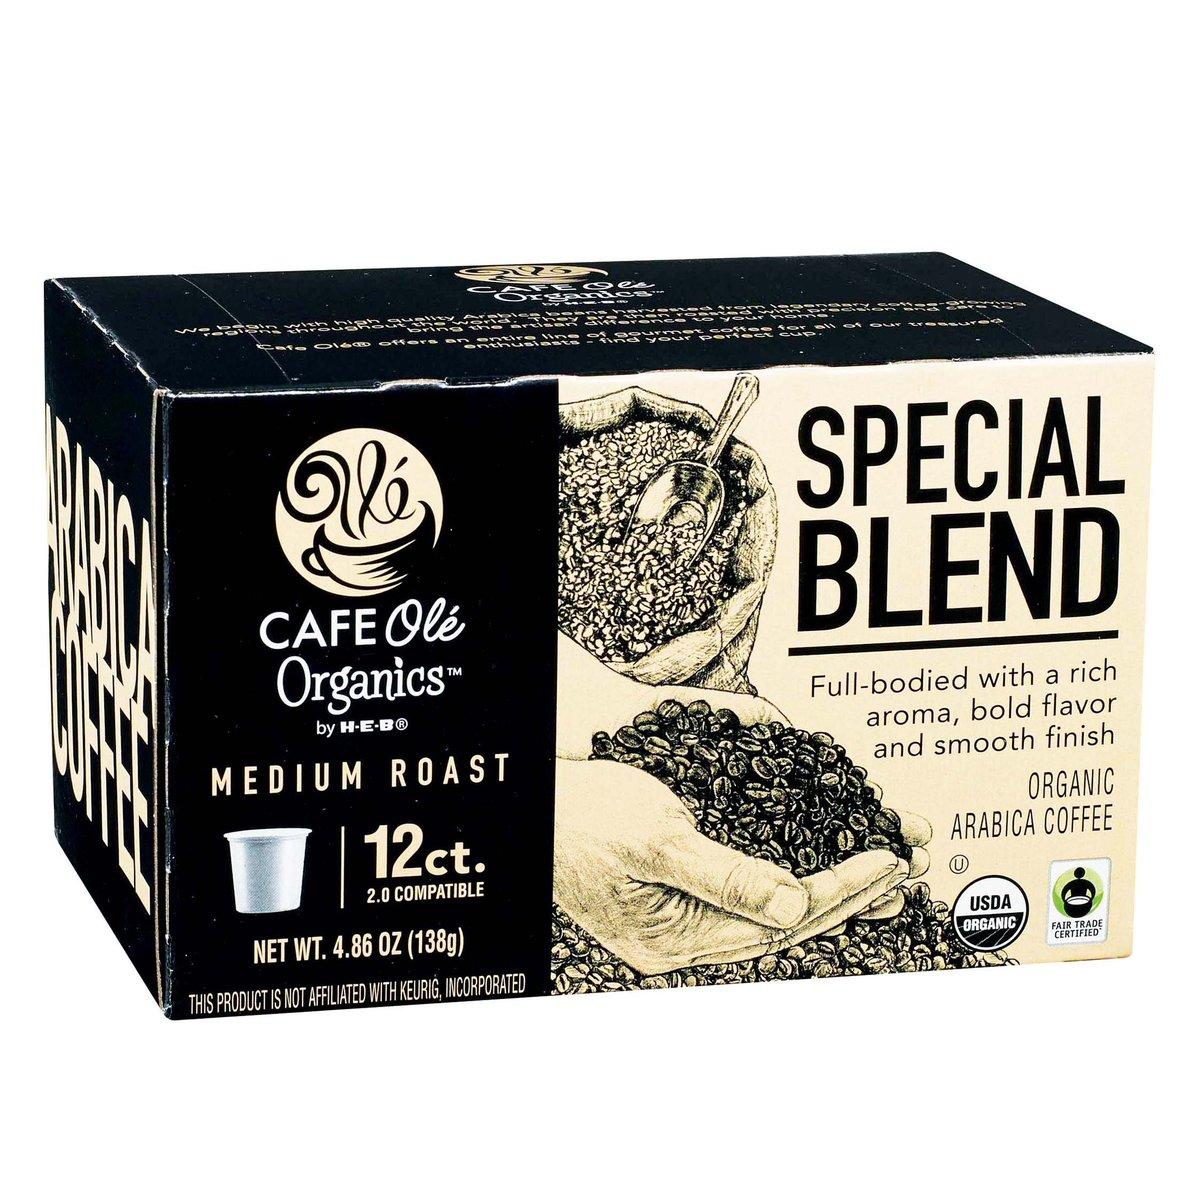 I love the @HEB Cafe Ole' special blend medium roast coffee ! ☕️Yummy ! #thursdaymorning